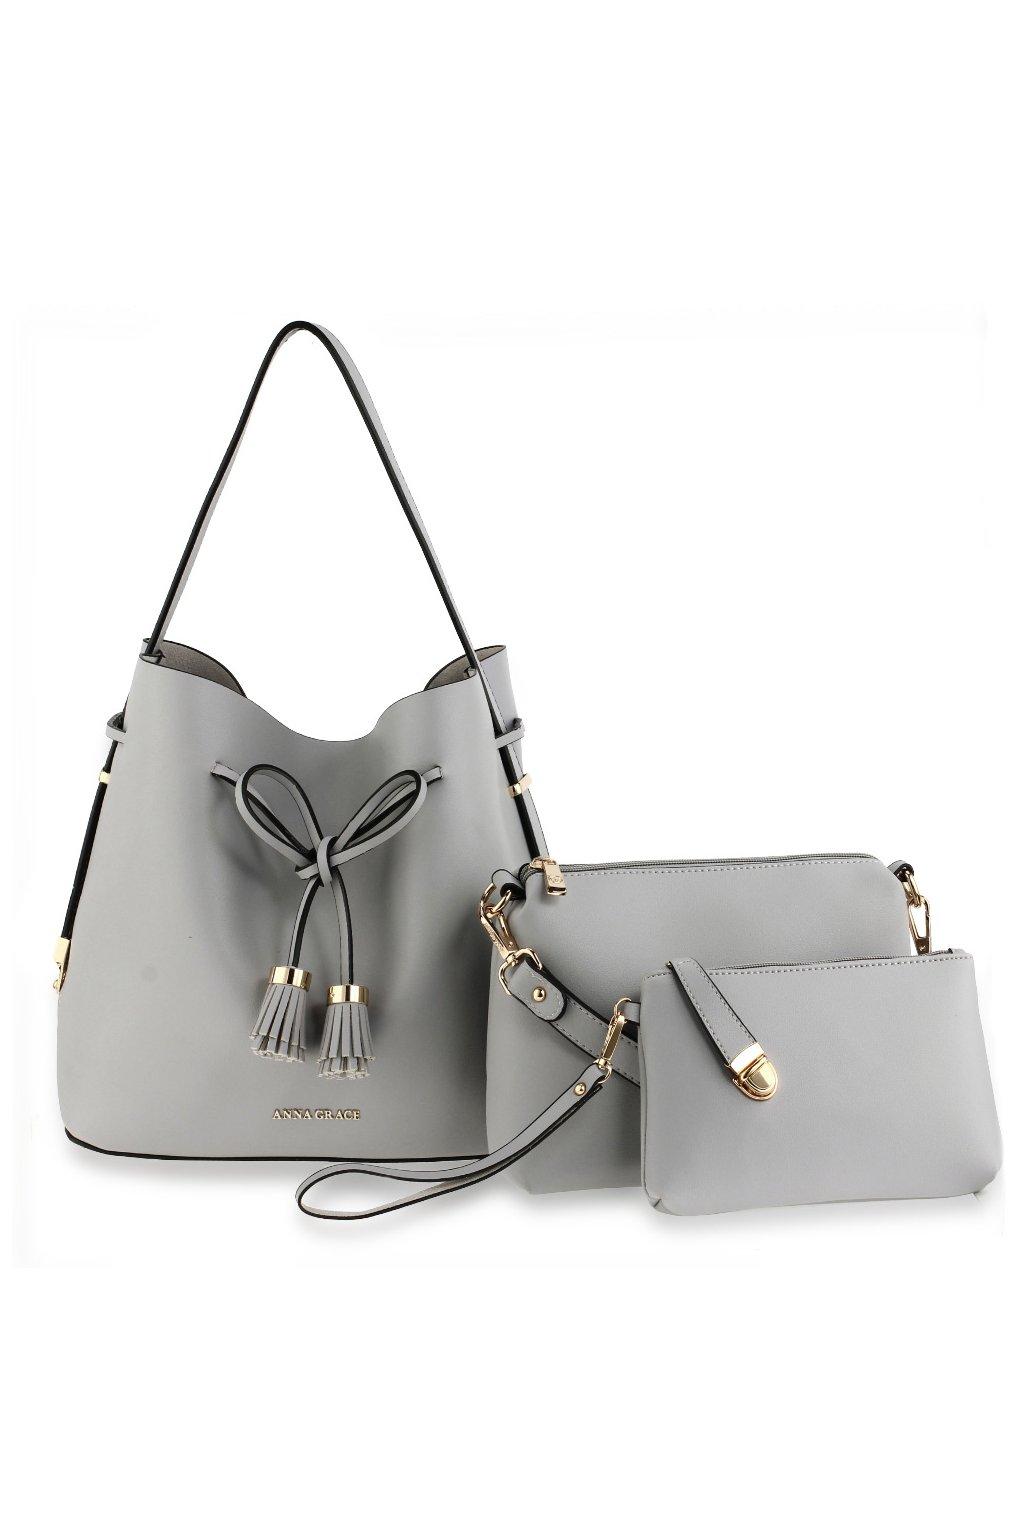 Kabelka na rameno Tiffany sivá AG00656